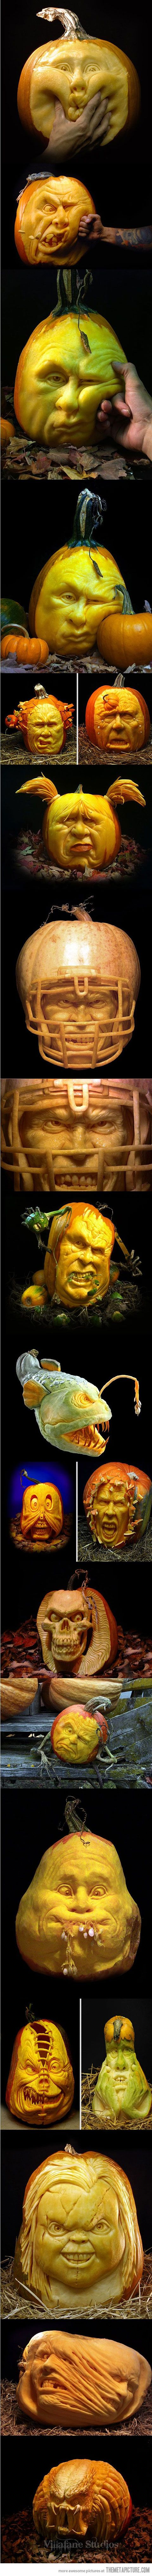 Amazing creative Pumpkin carvings!